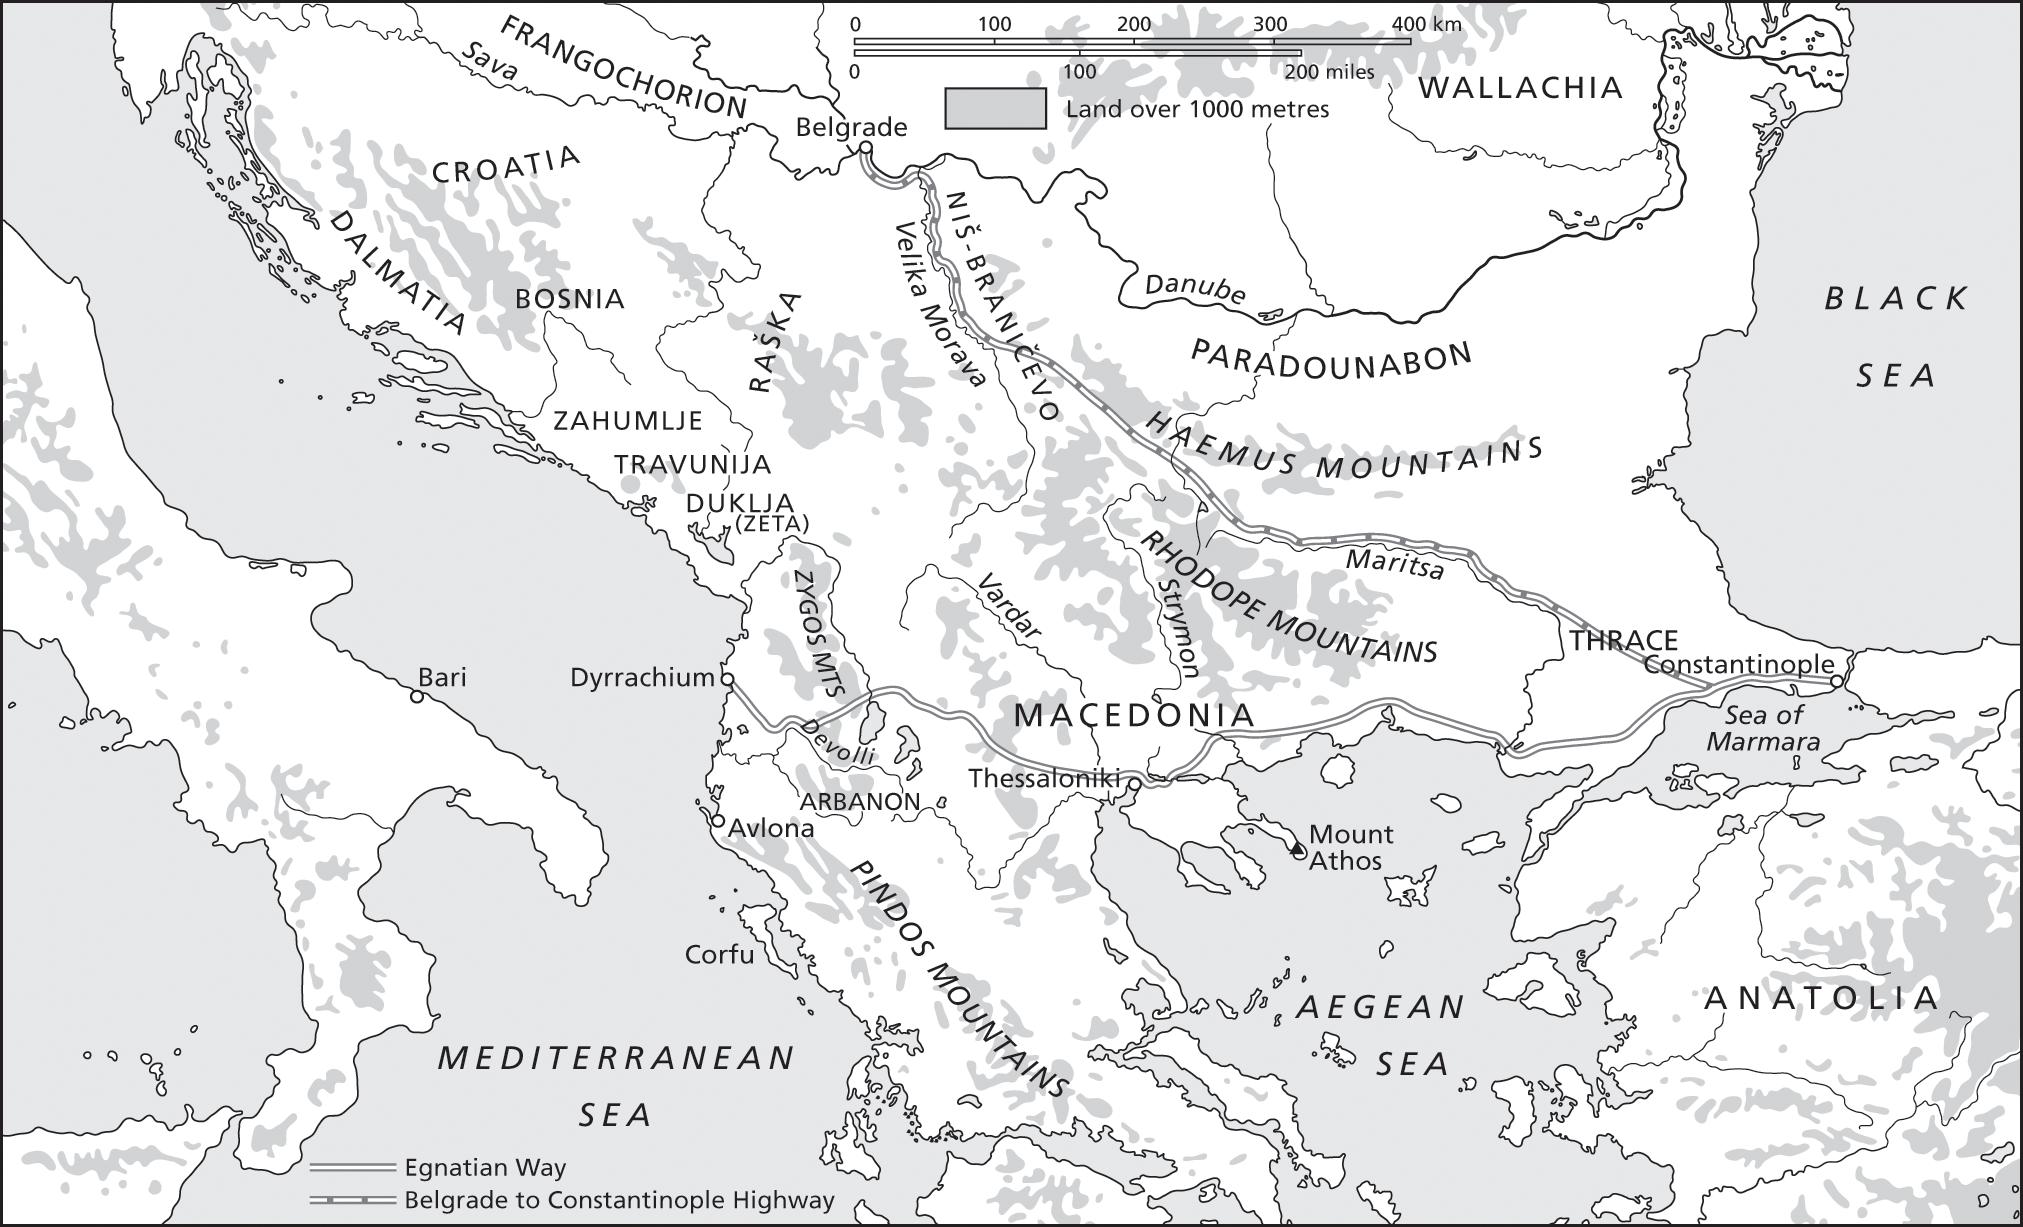 Balkan Borderlands 1018 1204 Chapter 18 The Cambridge History Of The Byzantine Empire C 500 1492